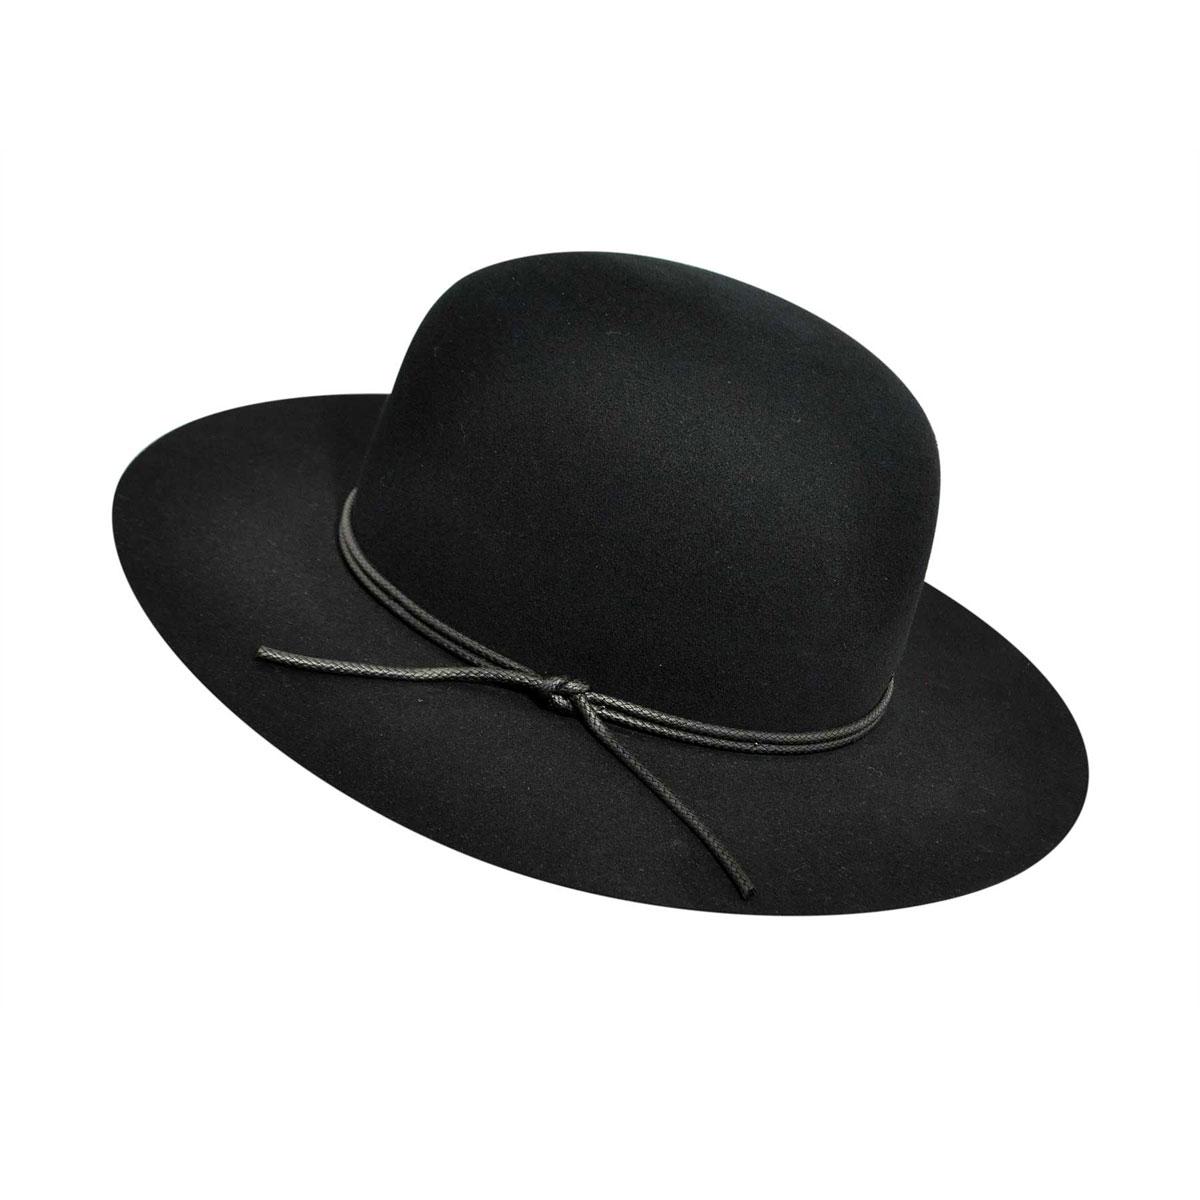 1940s Mens Shoes | Gangster, Spectator, Black and White Shoes Rollin Fedora $135.00 AT vintagedancer.com